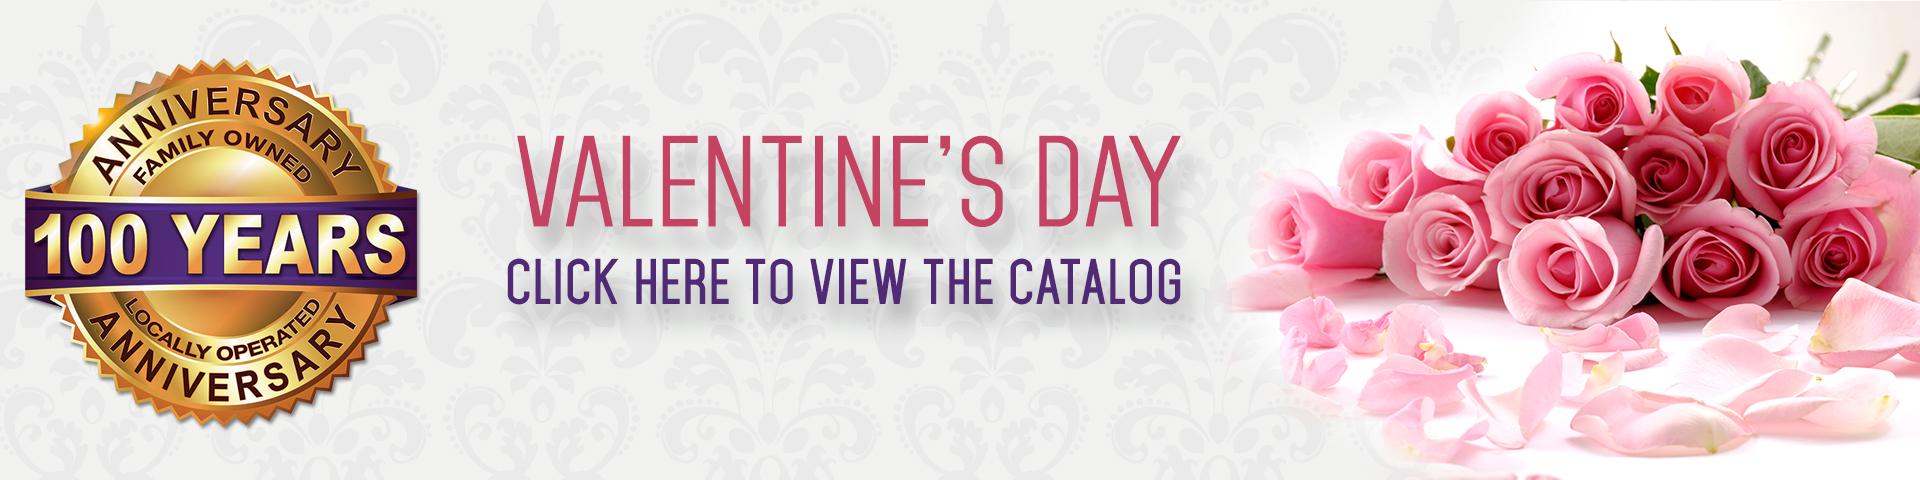 Valentines Online Catalog